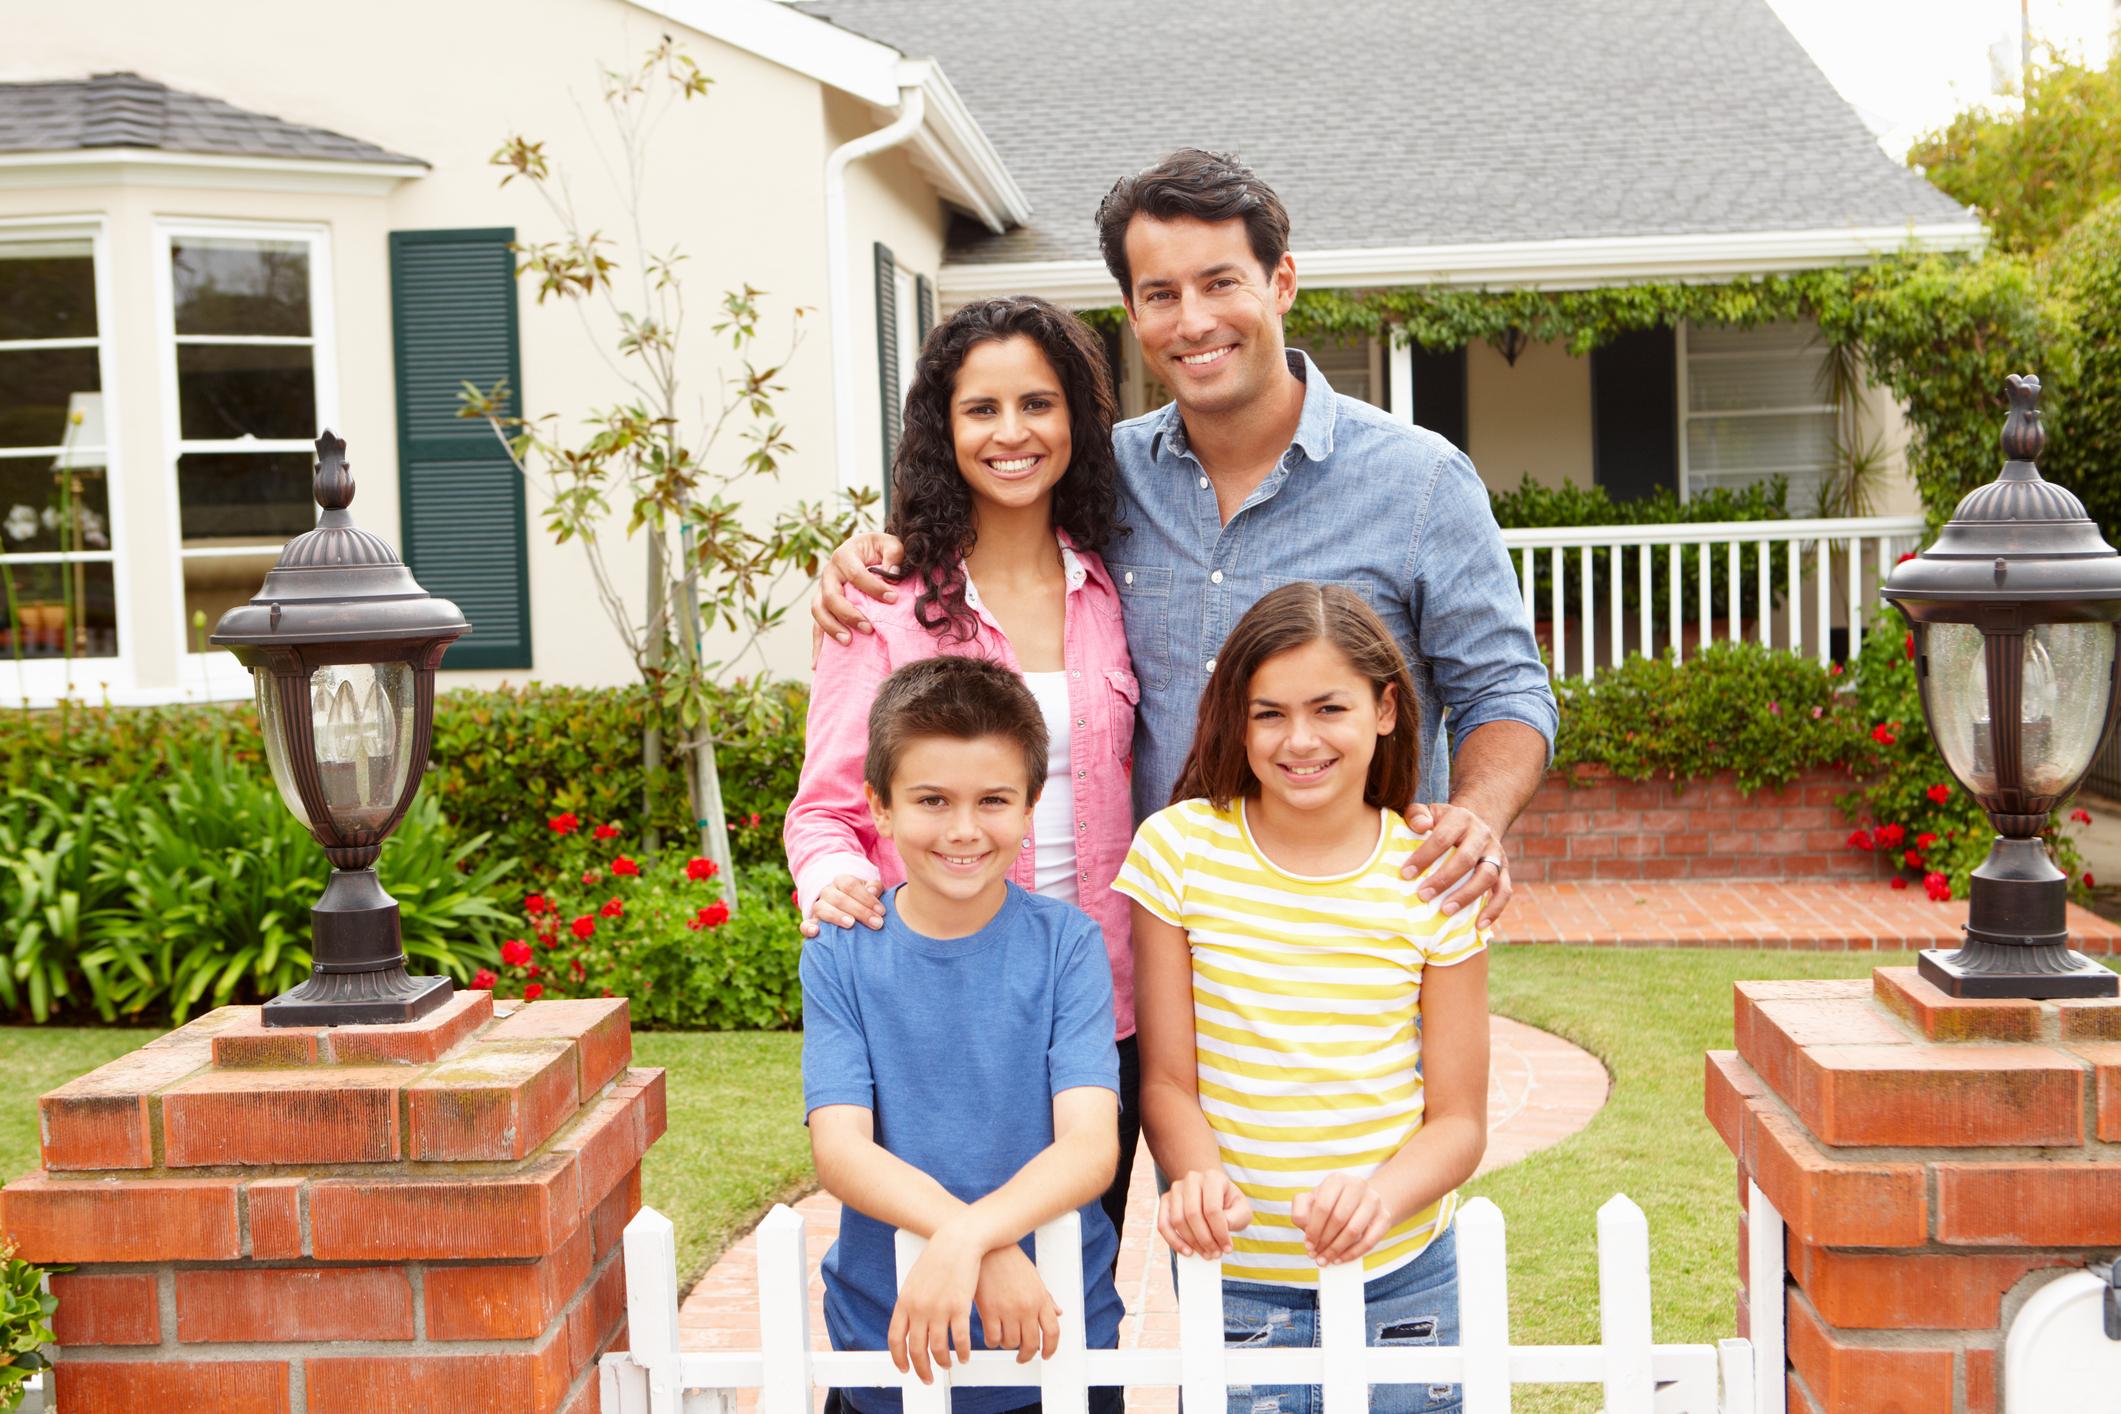 Hispanic Family Grad Brochure cover photo dreamstime_m_21156431.jpg